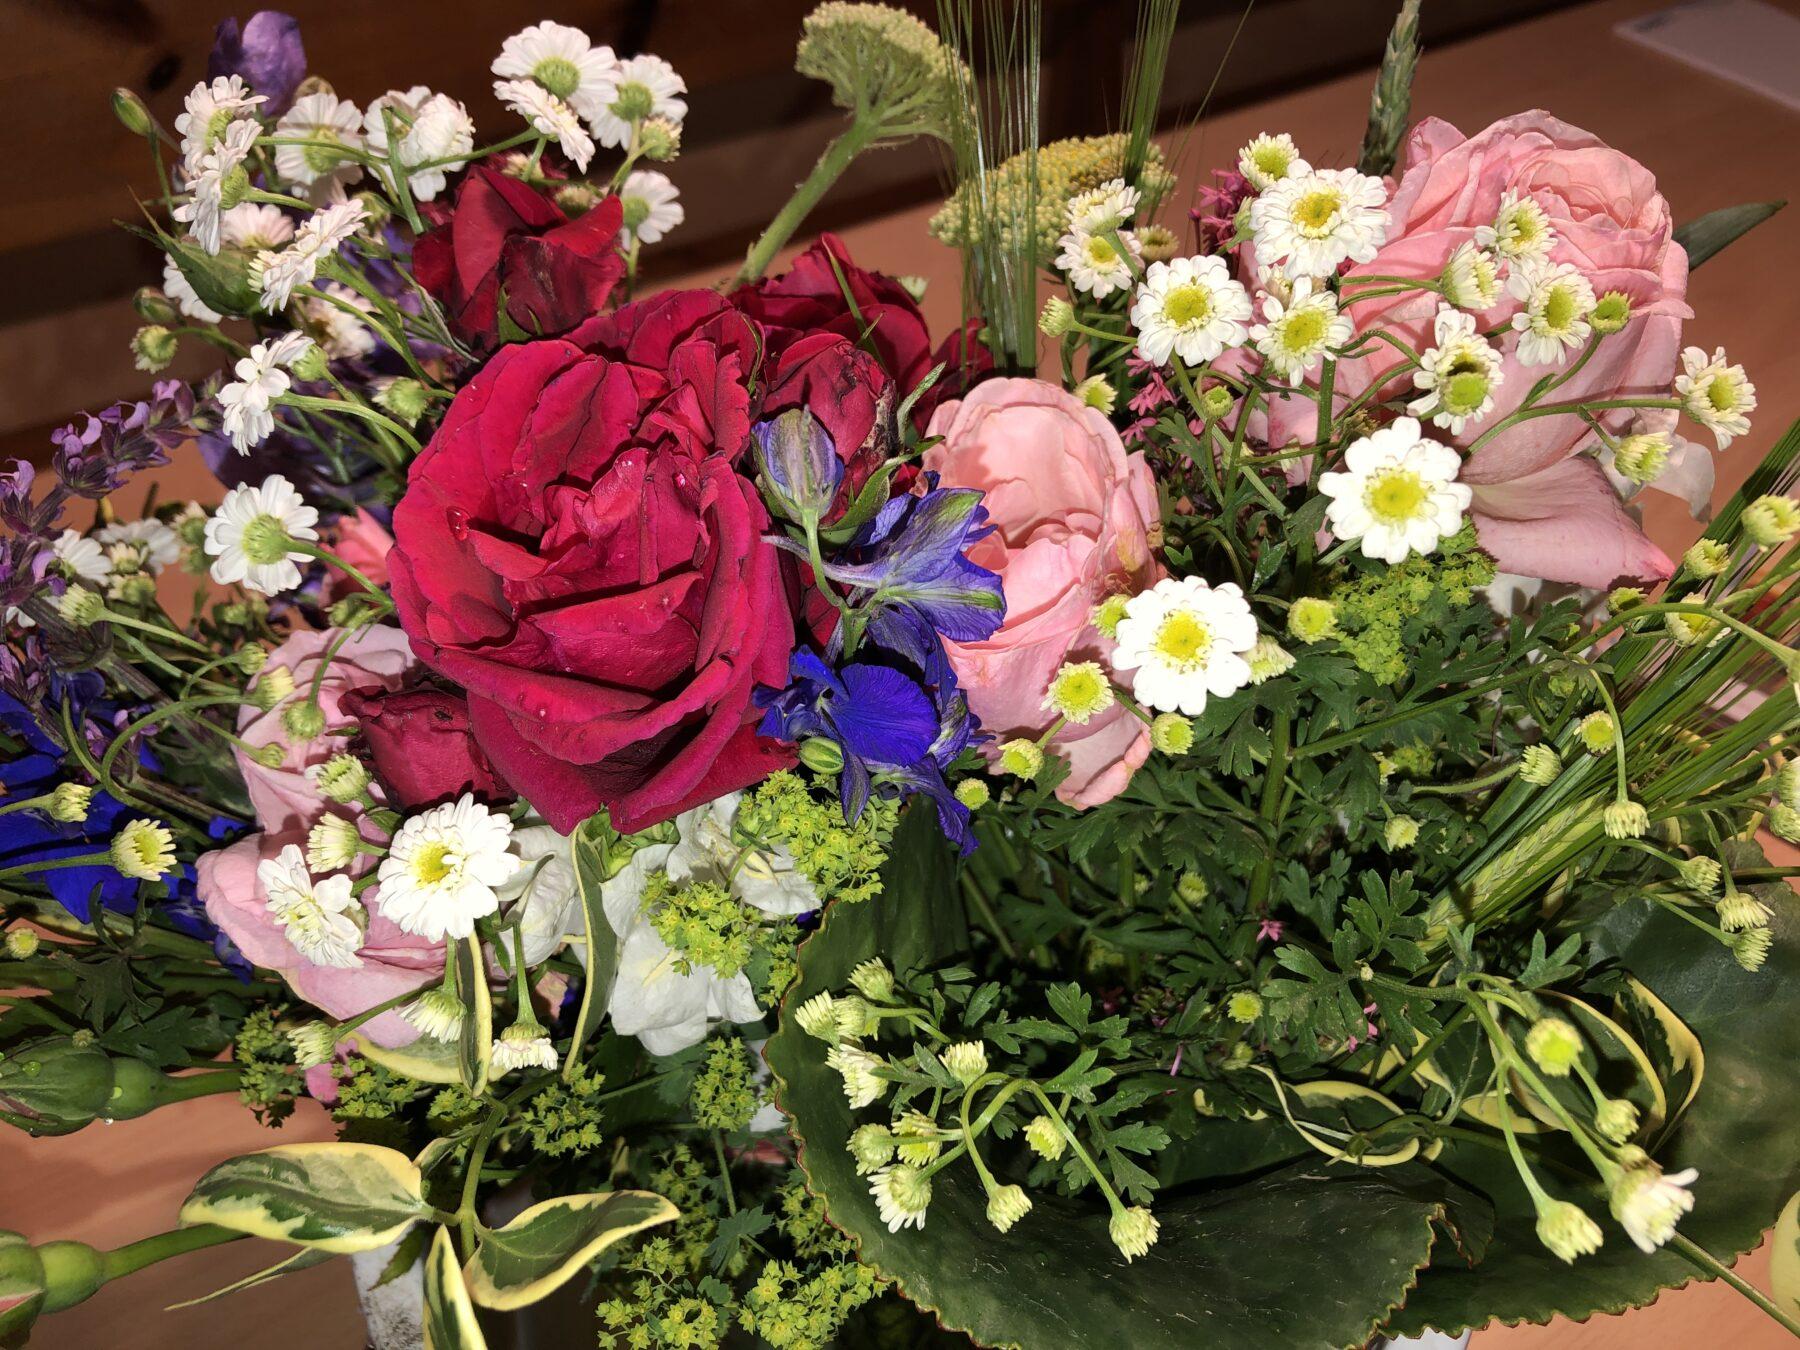 Bild: Blumengebinde